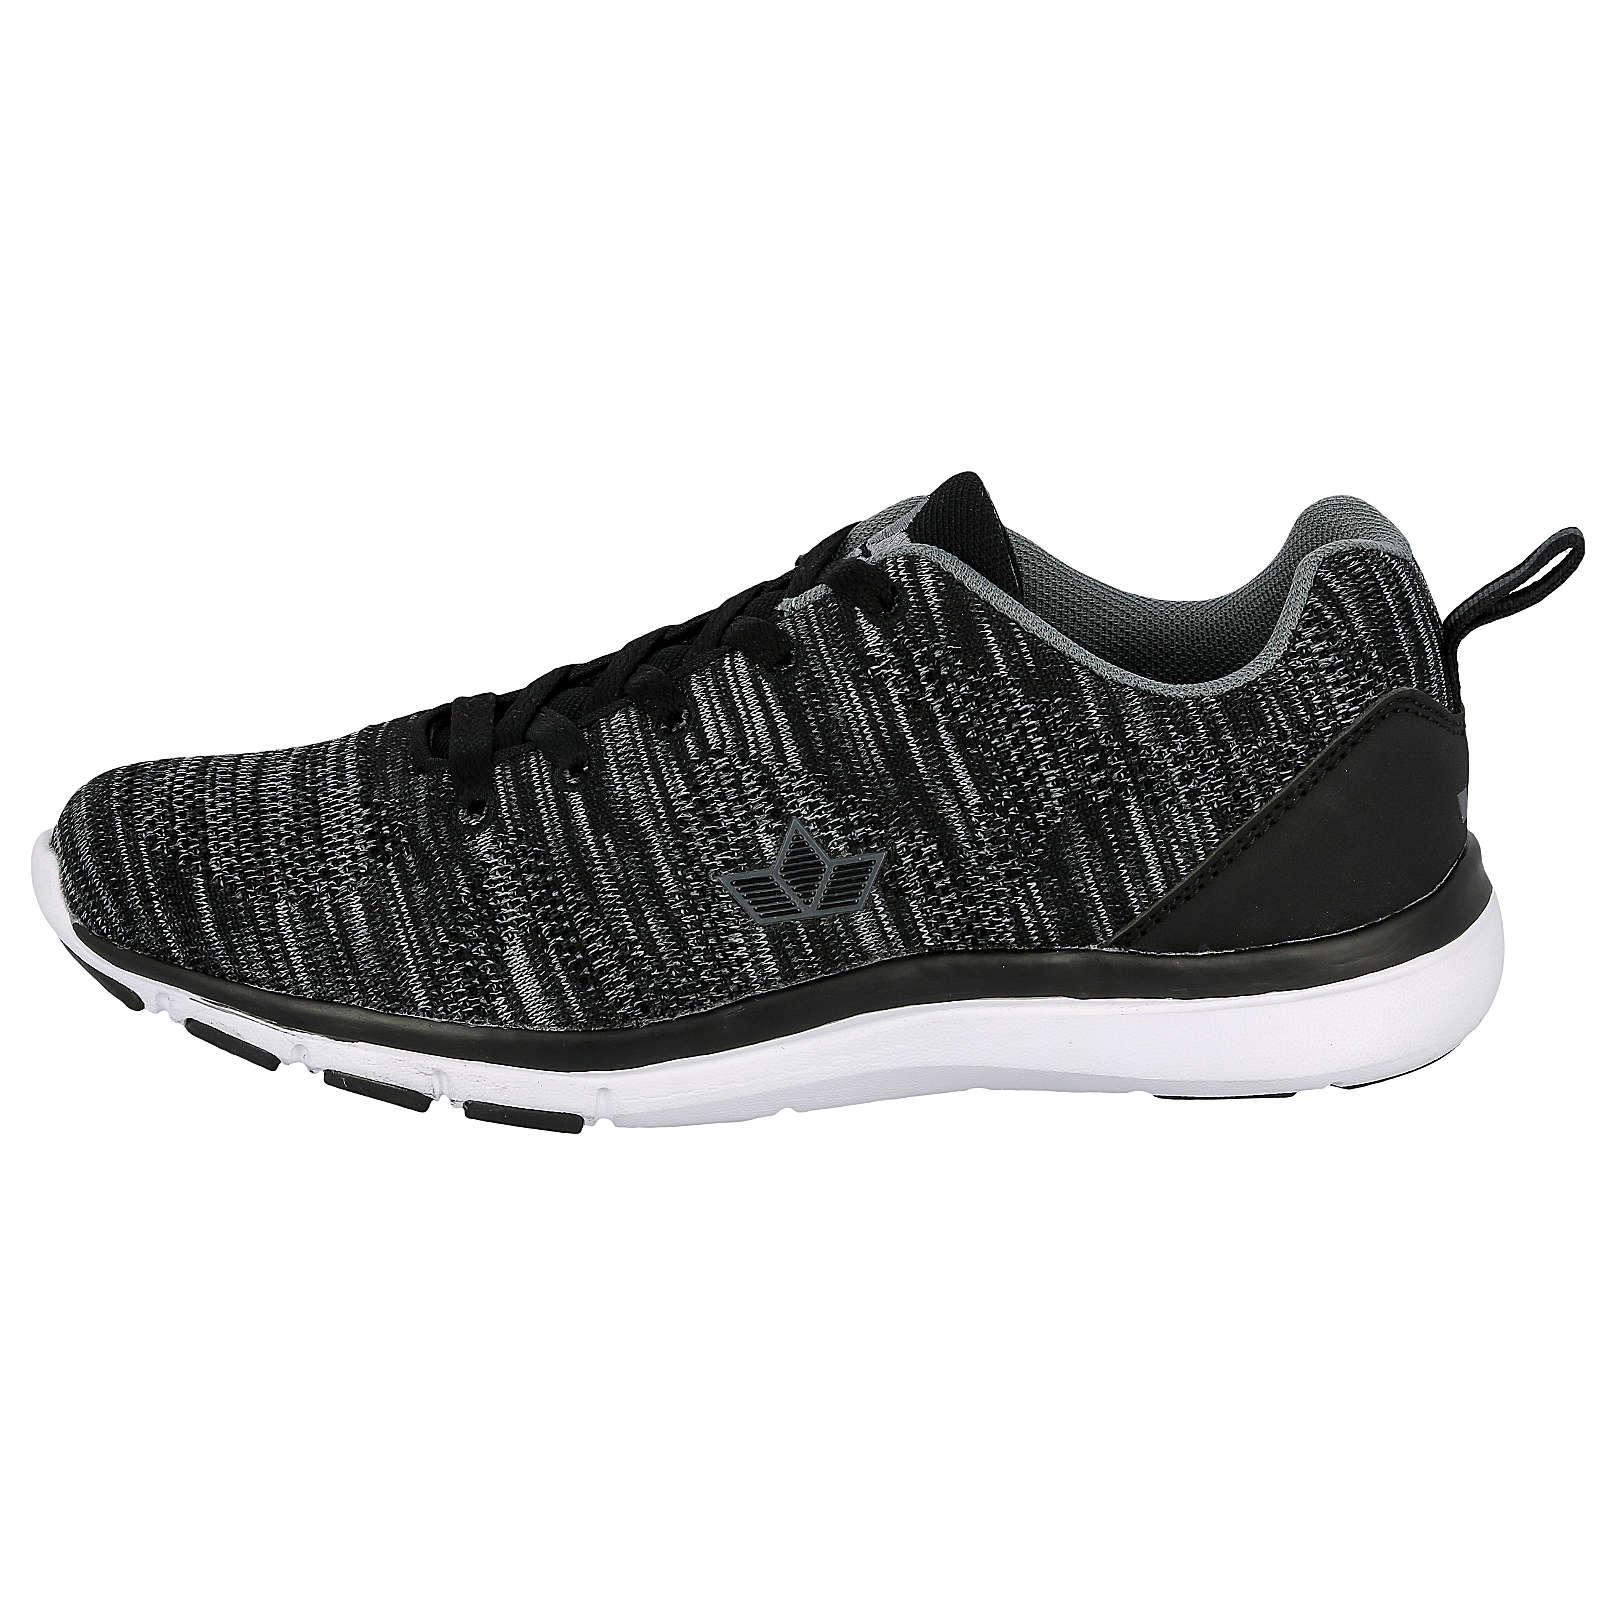 LICO Freizeitschuh Colour Sneakers Low grau Herren Gr. 38